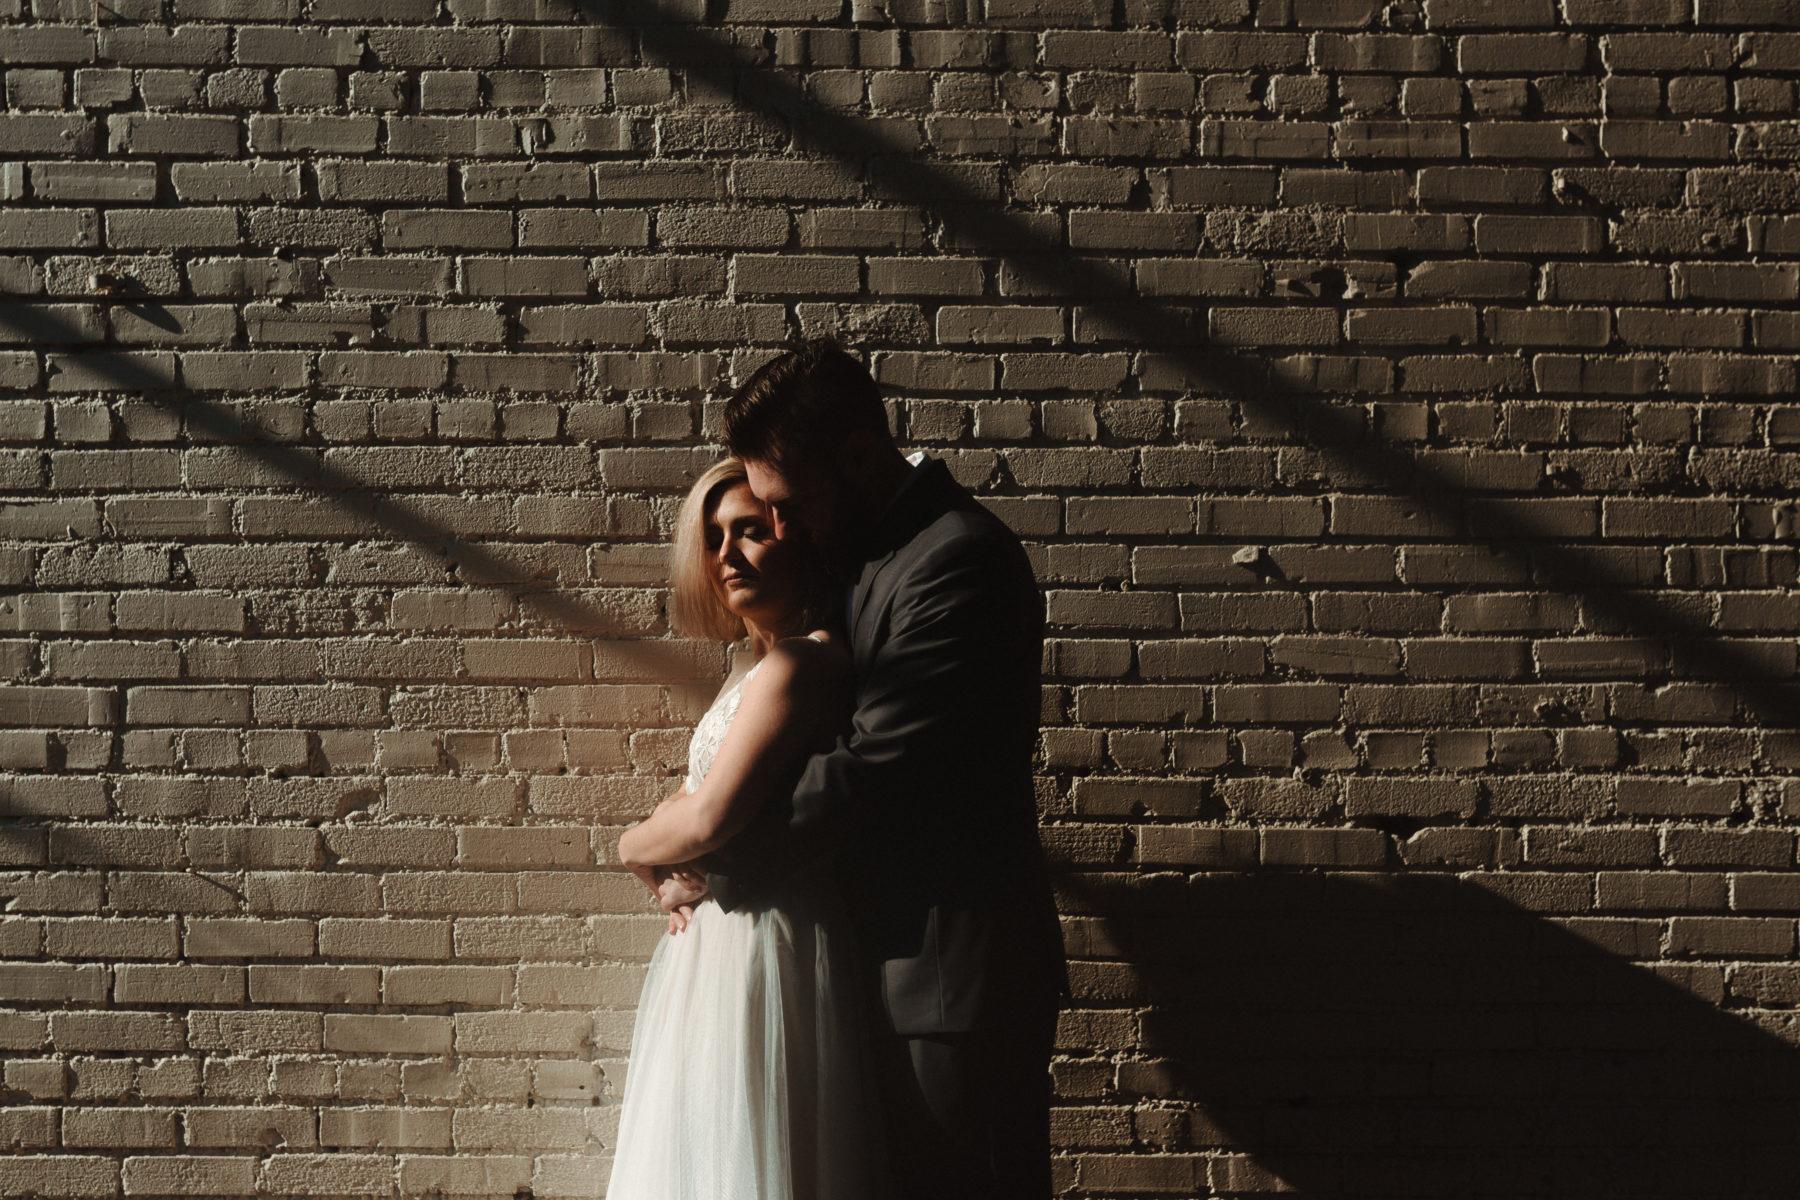 Romantic wedding photos: Nashville brunch elopement featured on Nashville Bride Guide